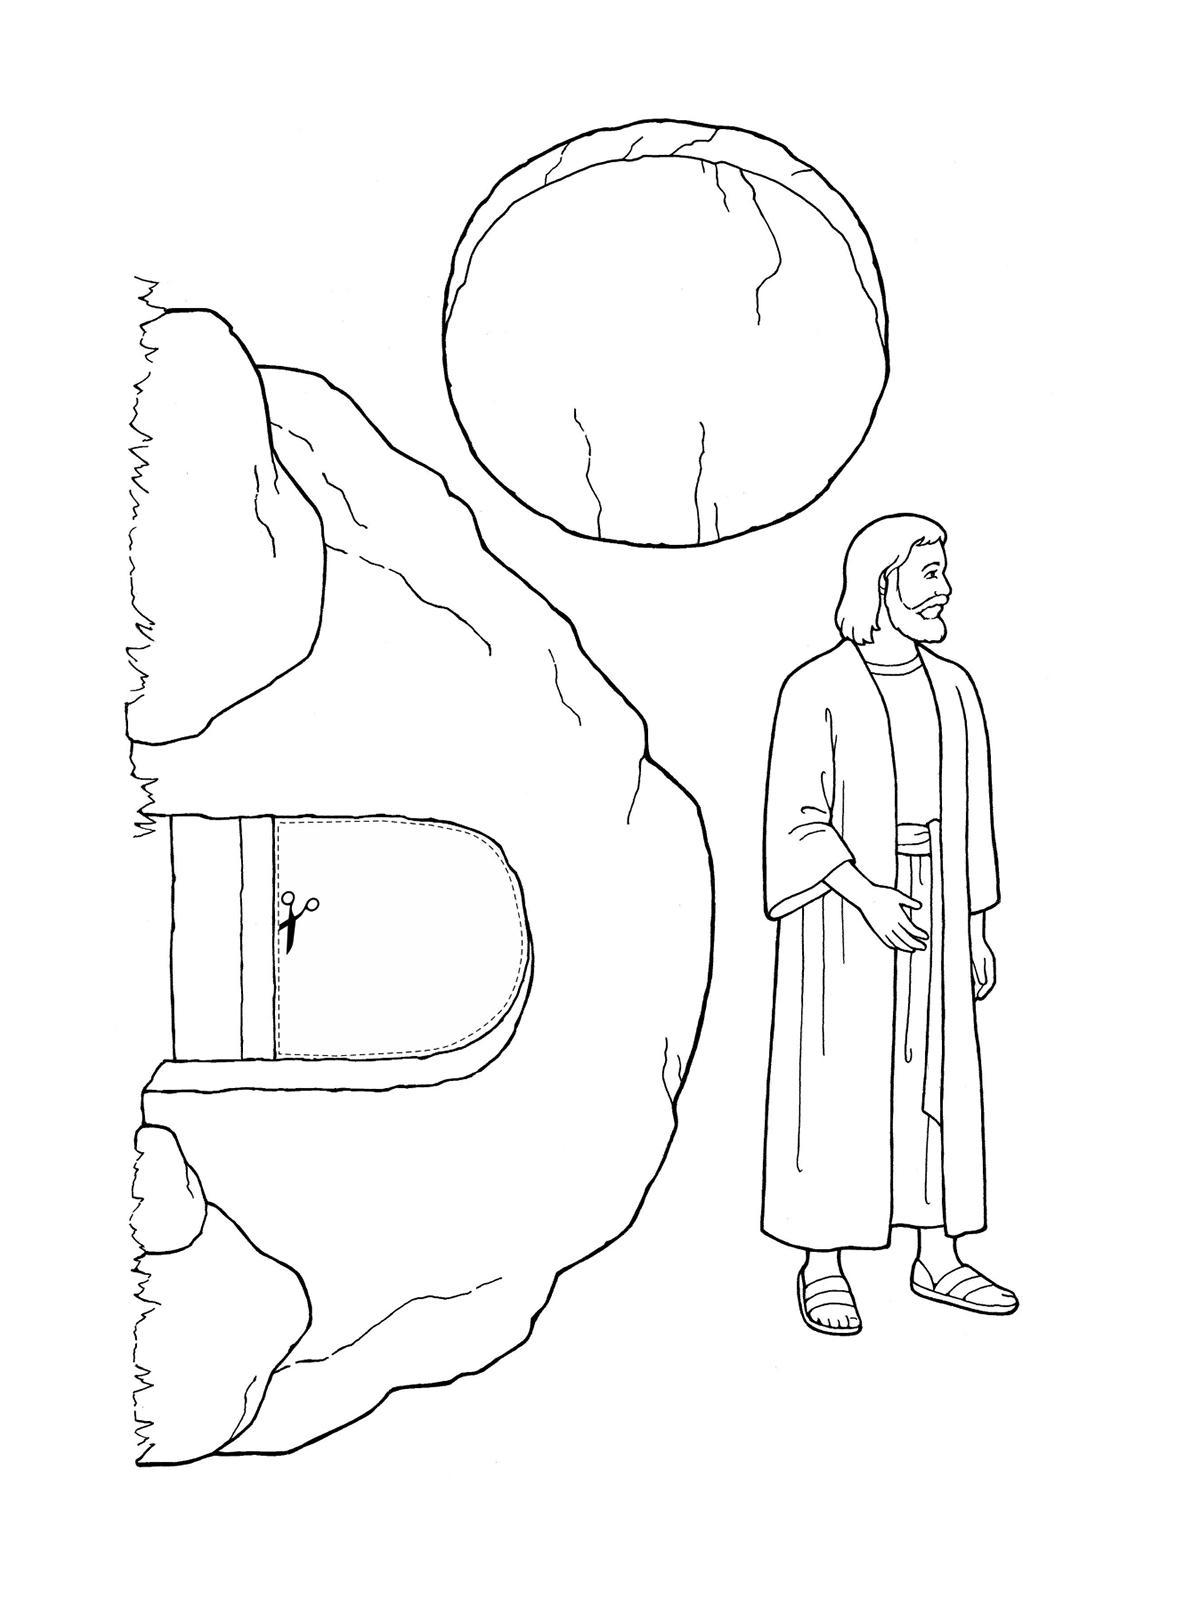 Nursery Manual Page 123 Jesus Christ Was Resurrected